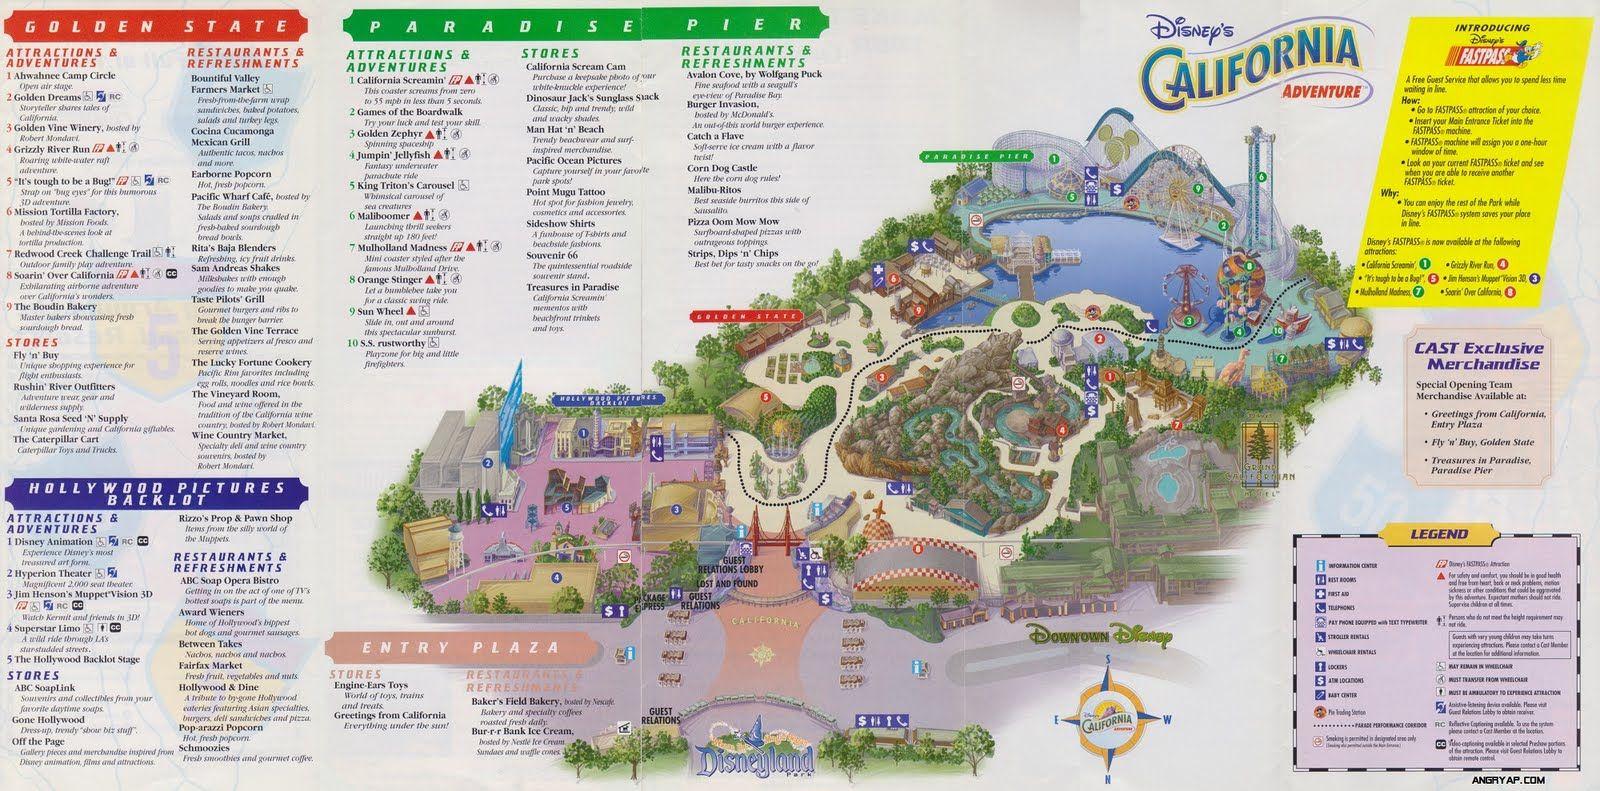 California Adventure 2001 Disneyland Map Disneyland